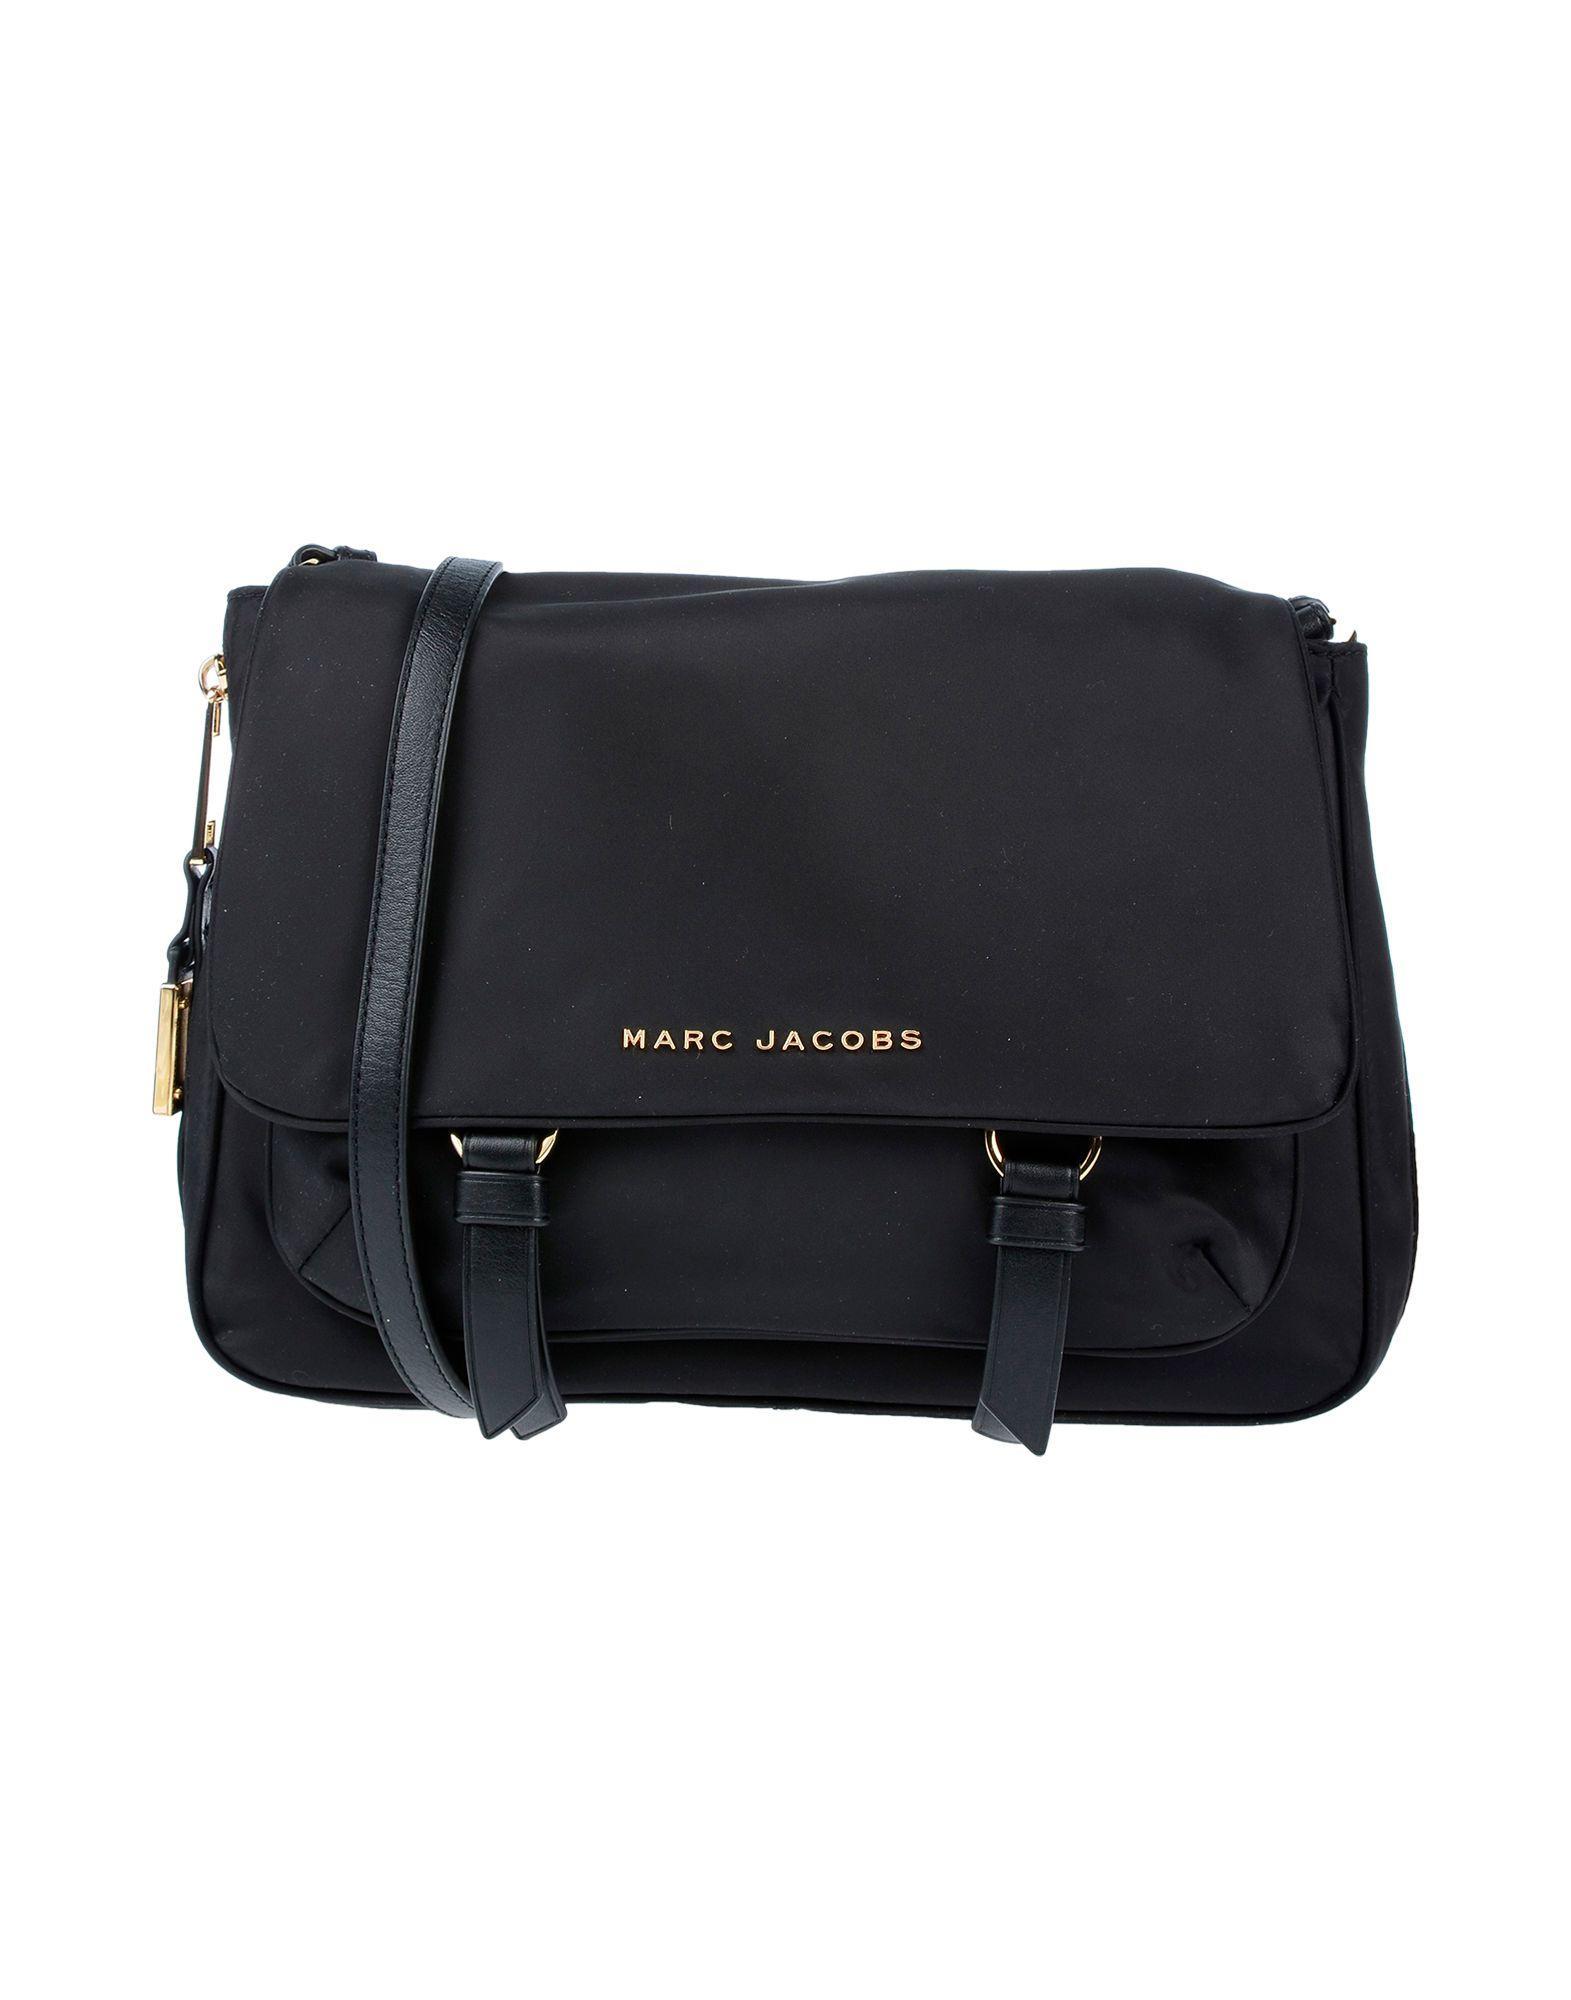 8076be2ed755 Marc Jacobs - Black Cross-body Bag - Lyst. View fullscreen